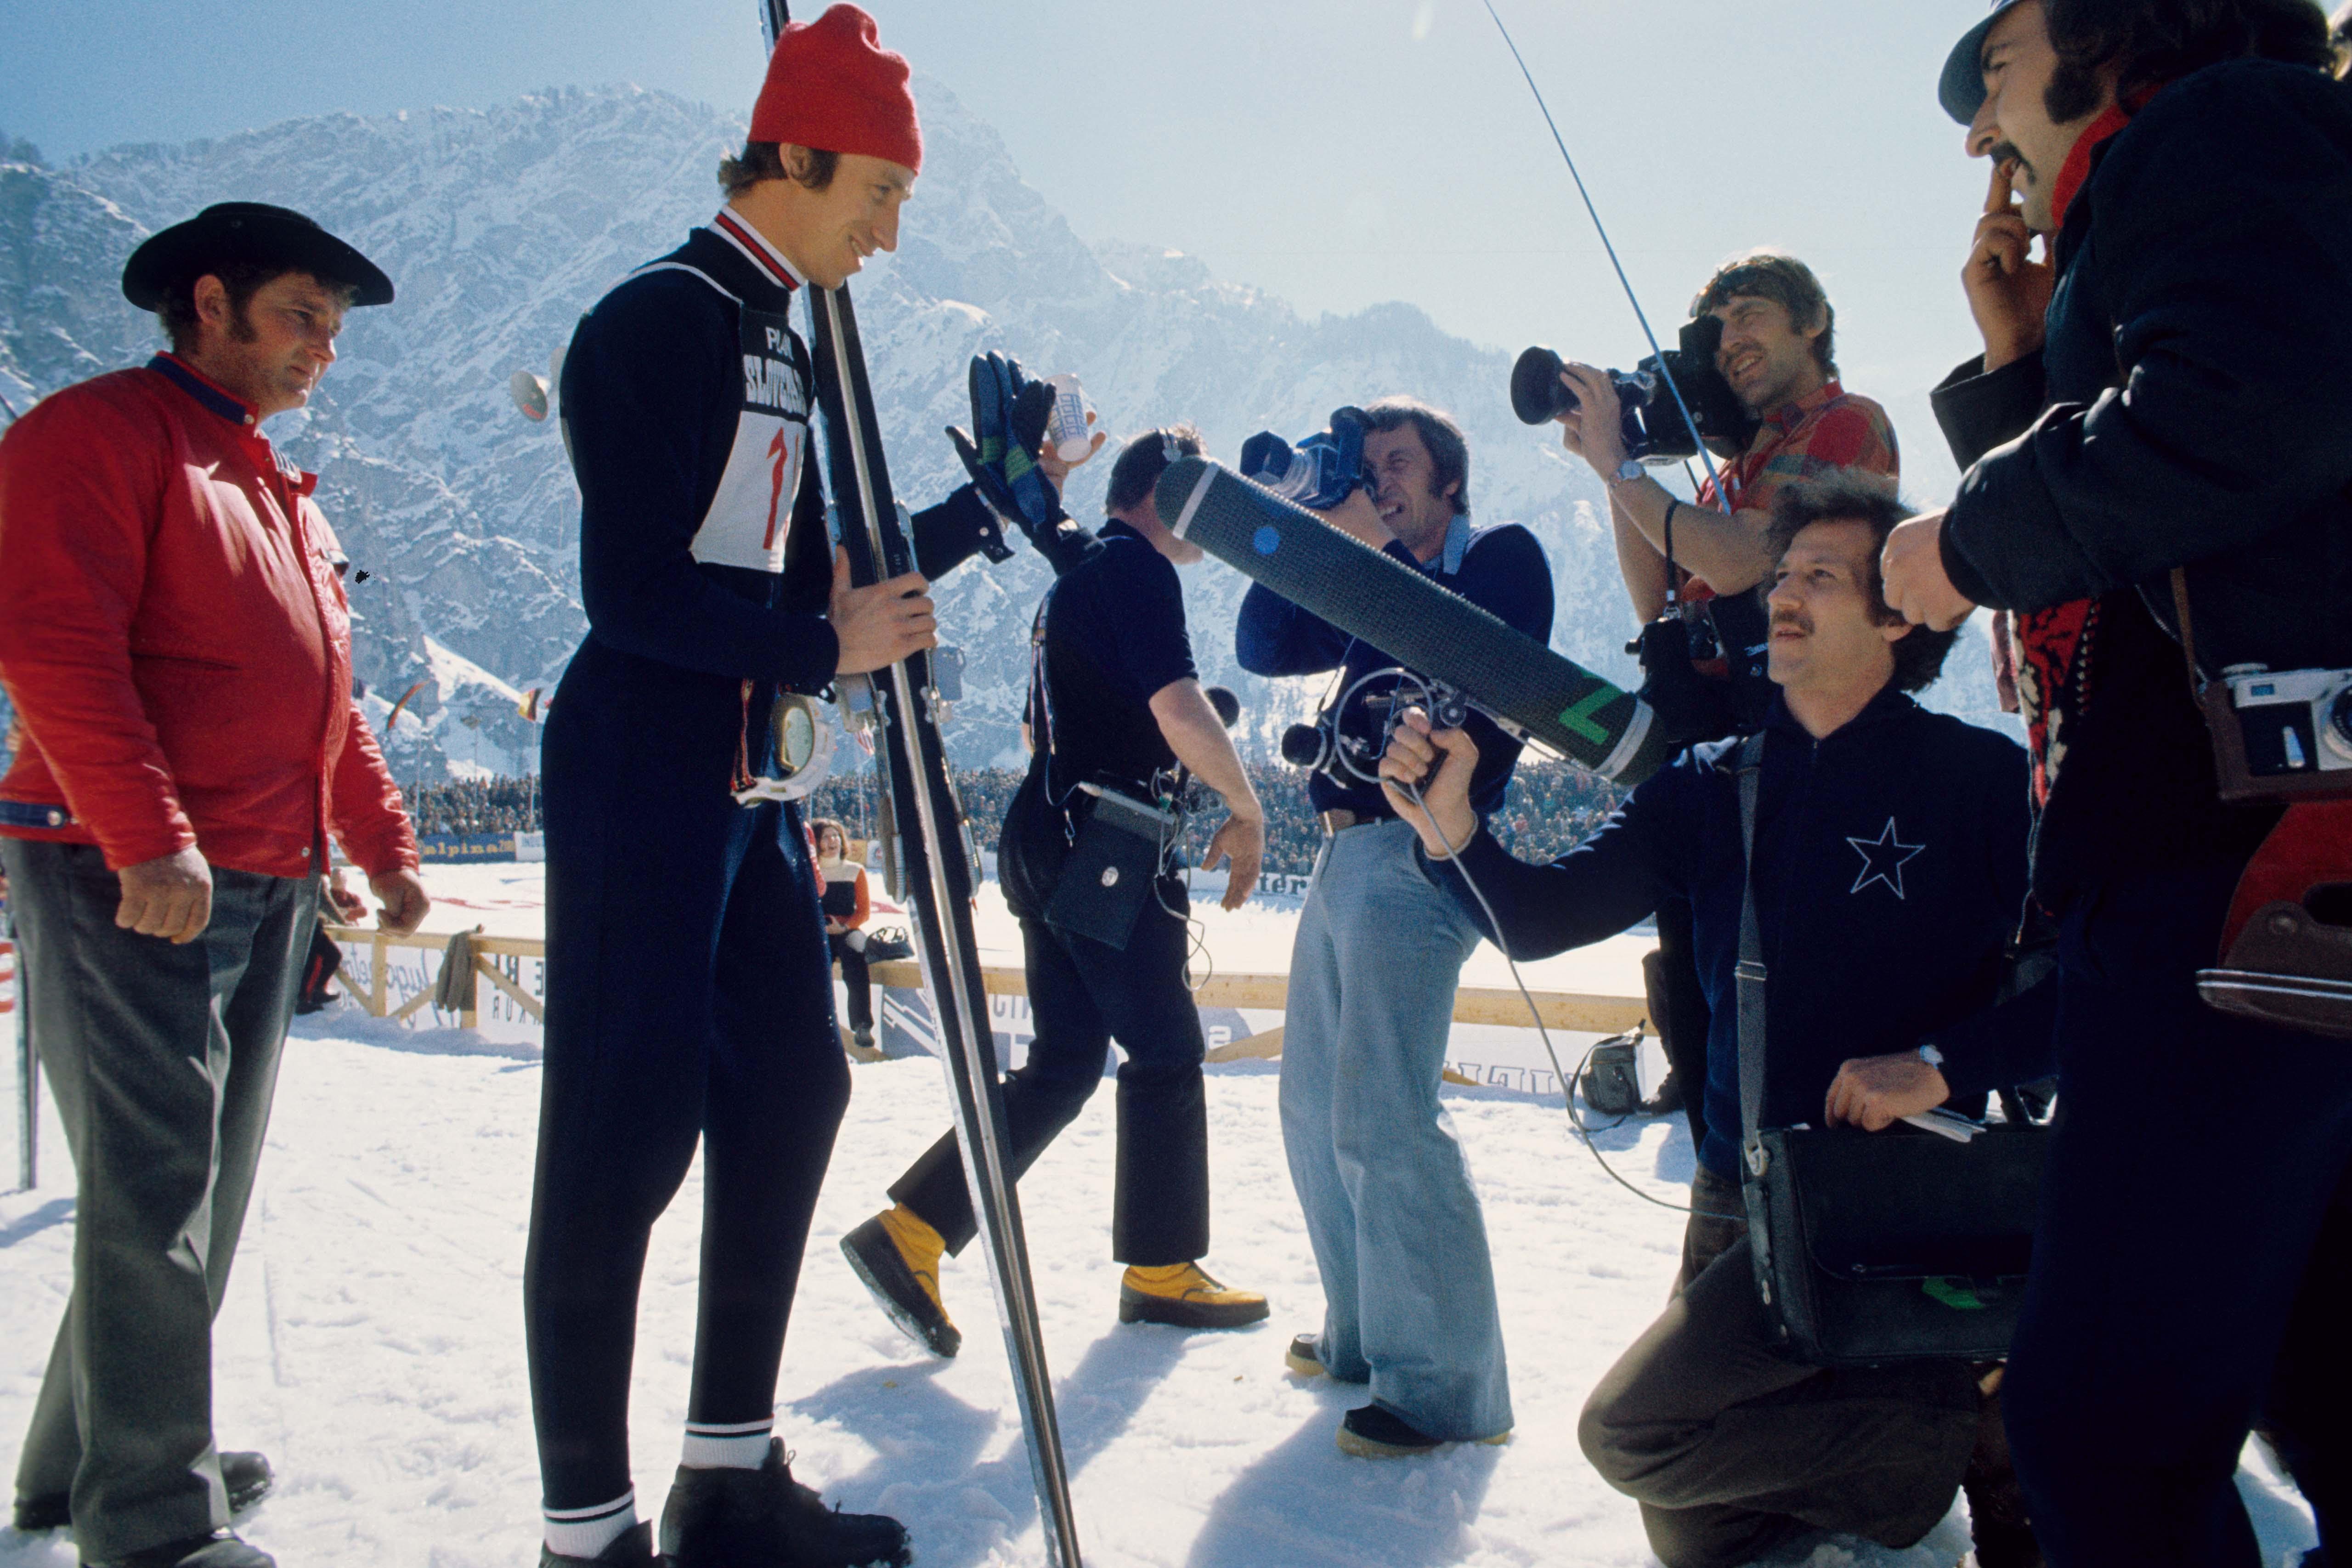 Behind the scenes of the film Die große Ekstase des Bildschnitzers Steiner